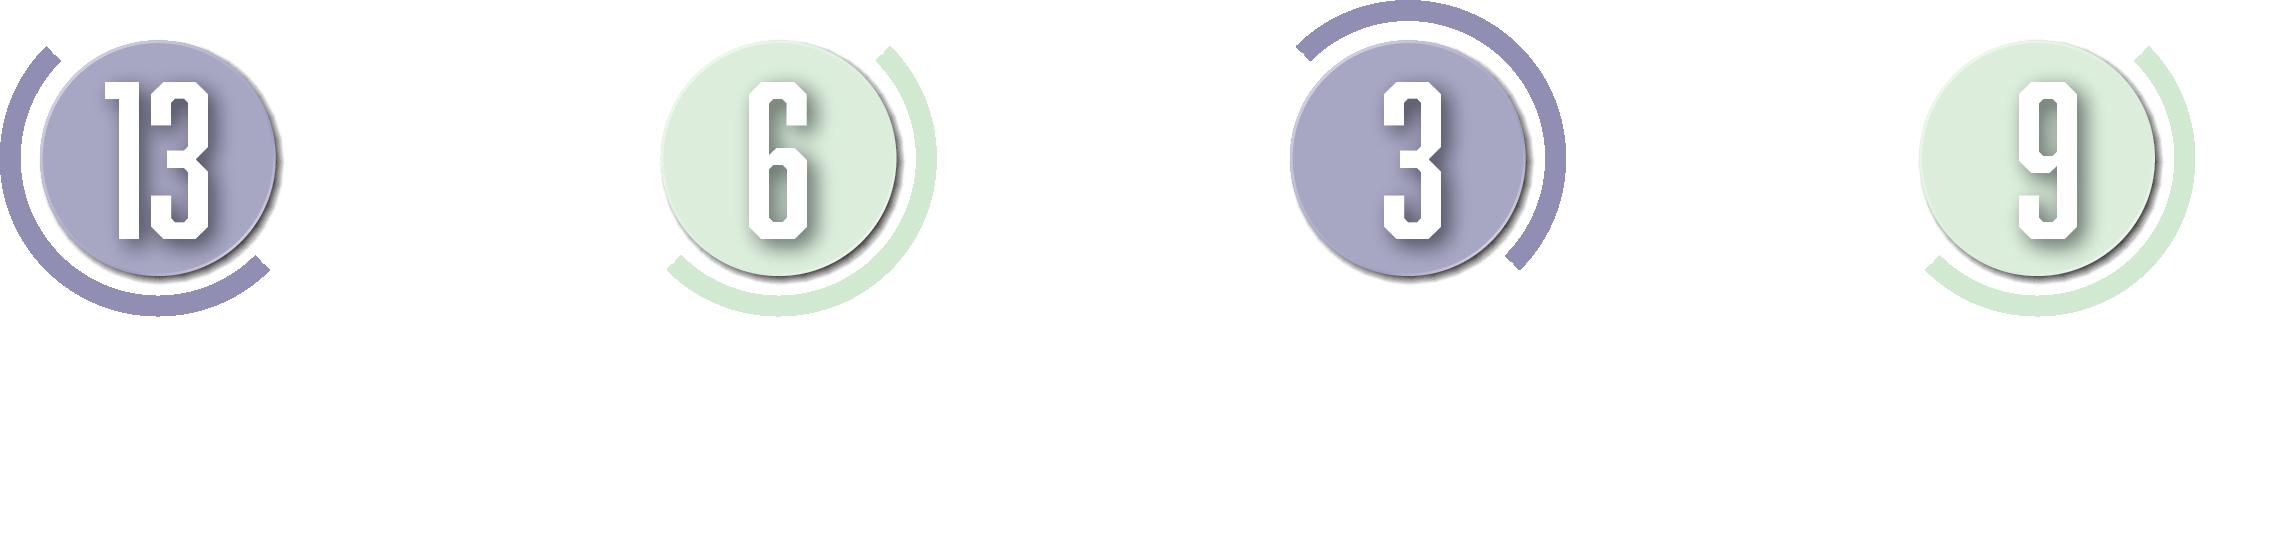 Asset 3@debateprep icons devp.png